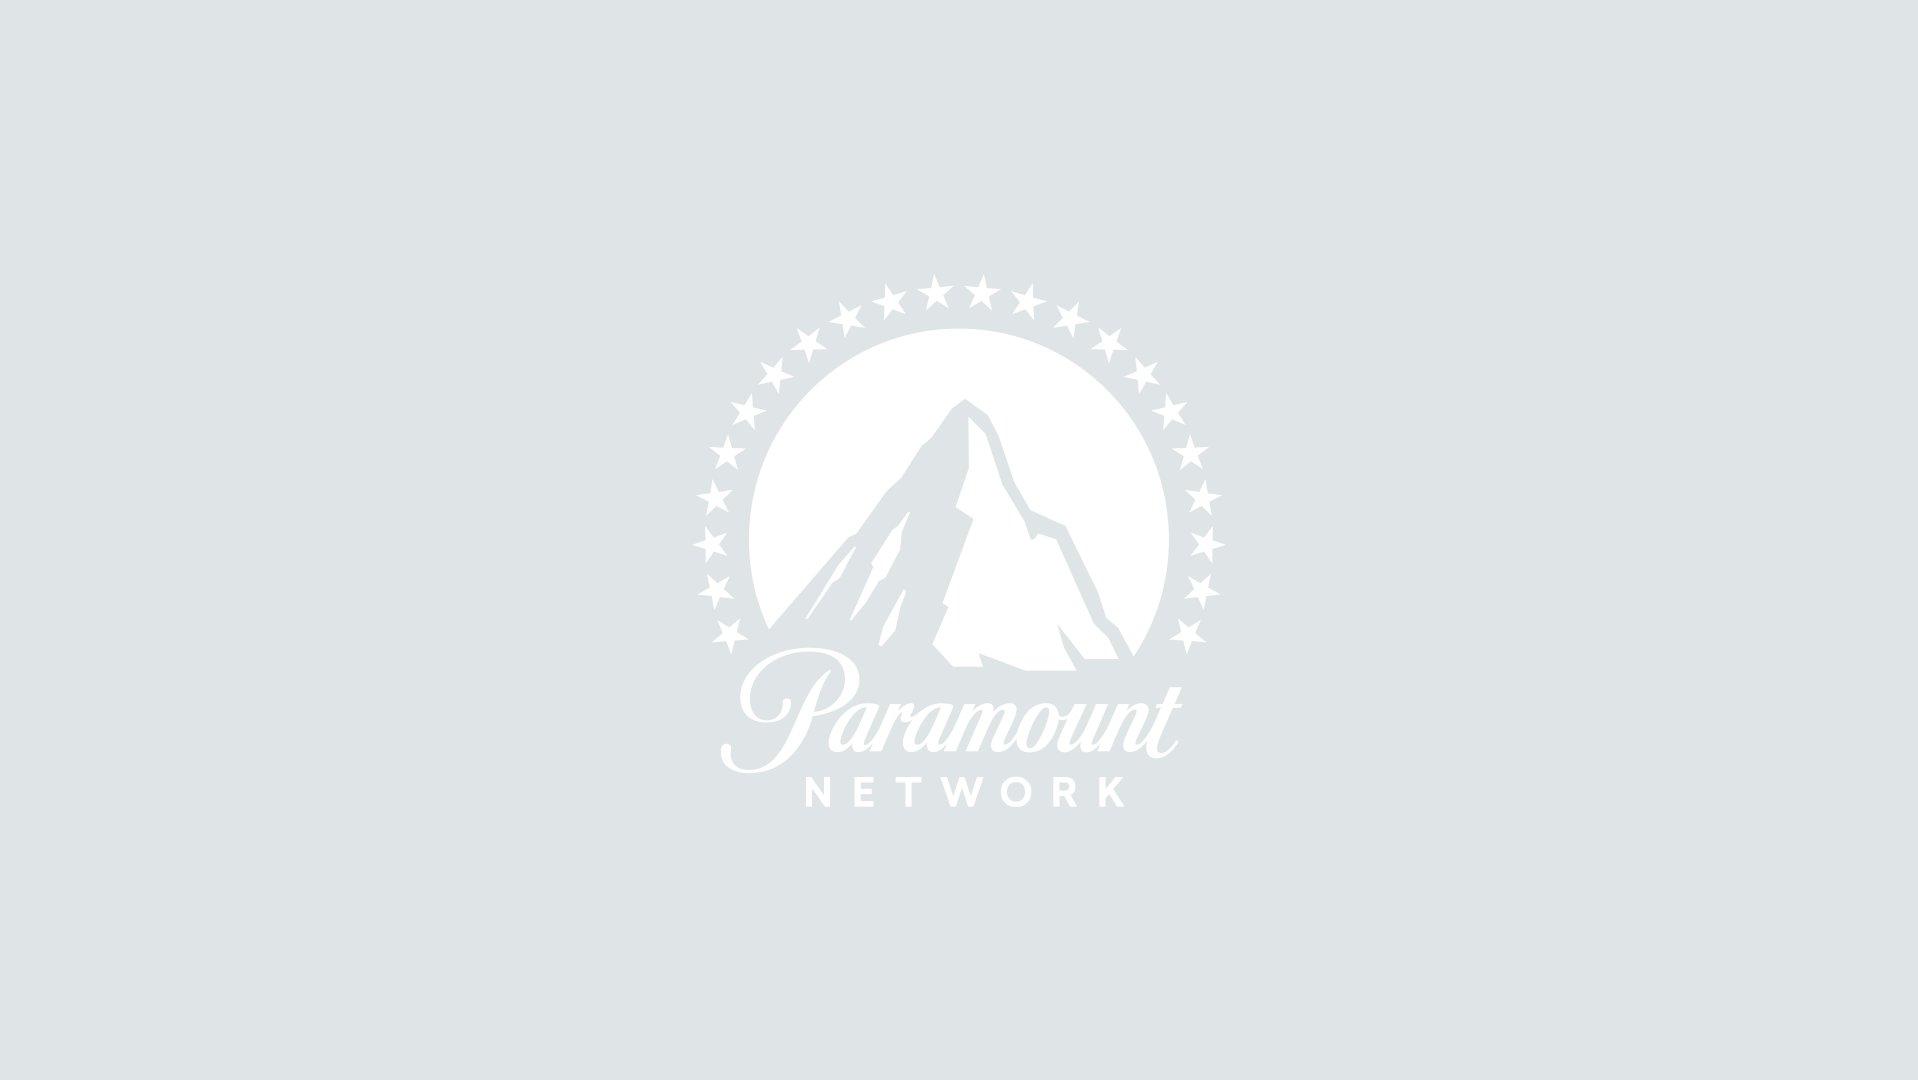 Ewan McGregor e Nicole Kidman (Moulin Rouge!), foto: Getty Images